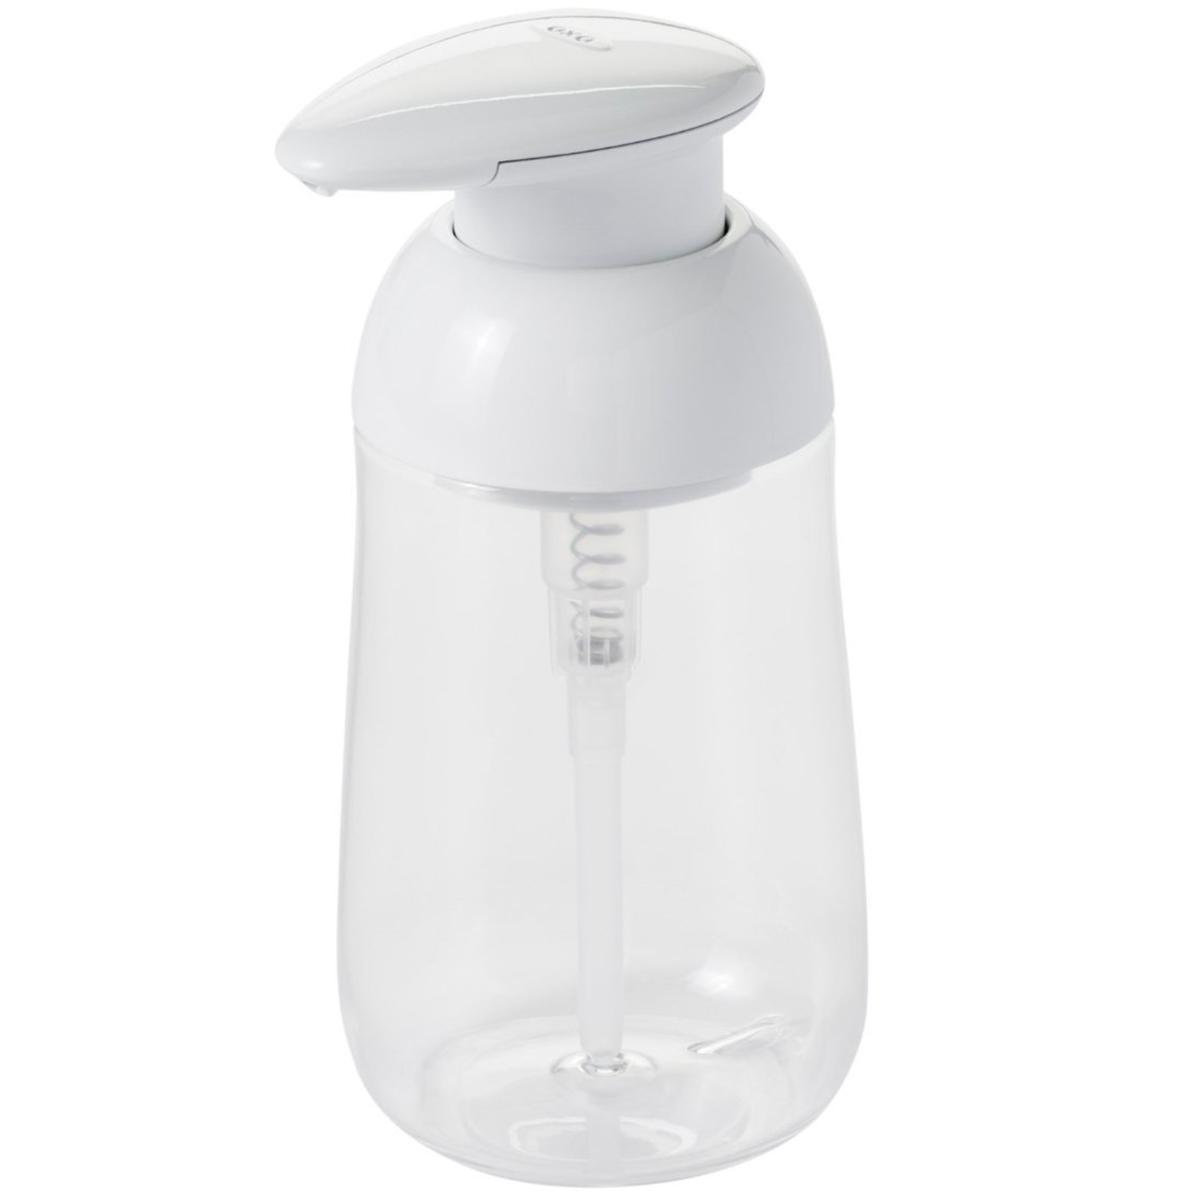 Dispensador jabón cocina Oxo blanco transparente   Gadgets & Cuina